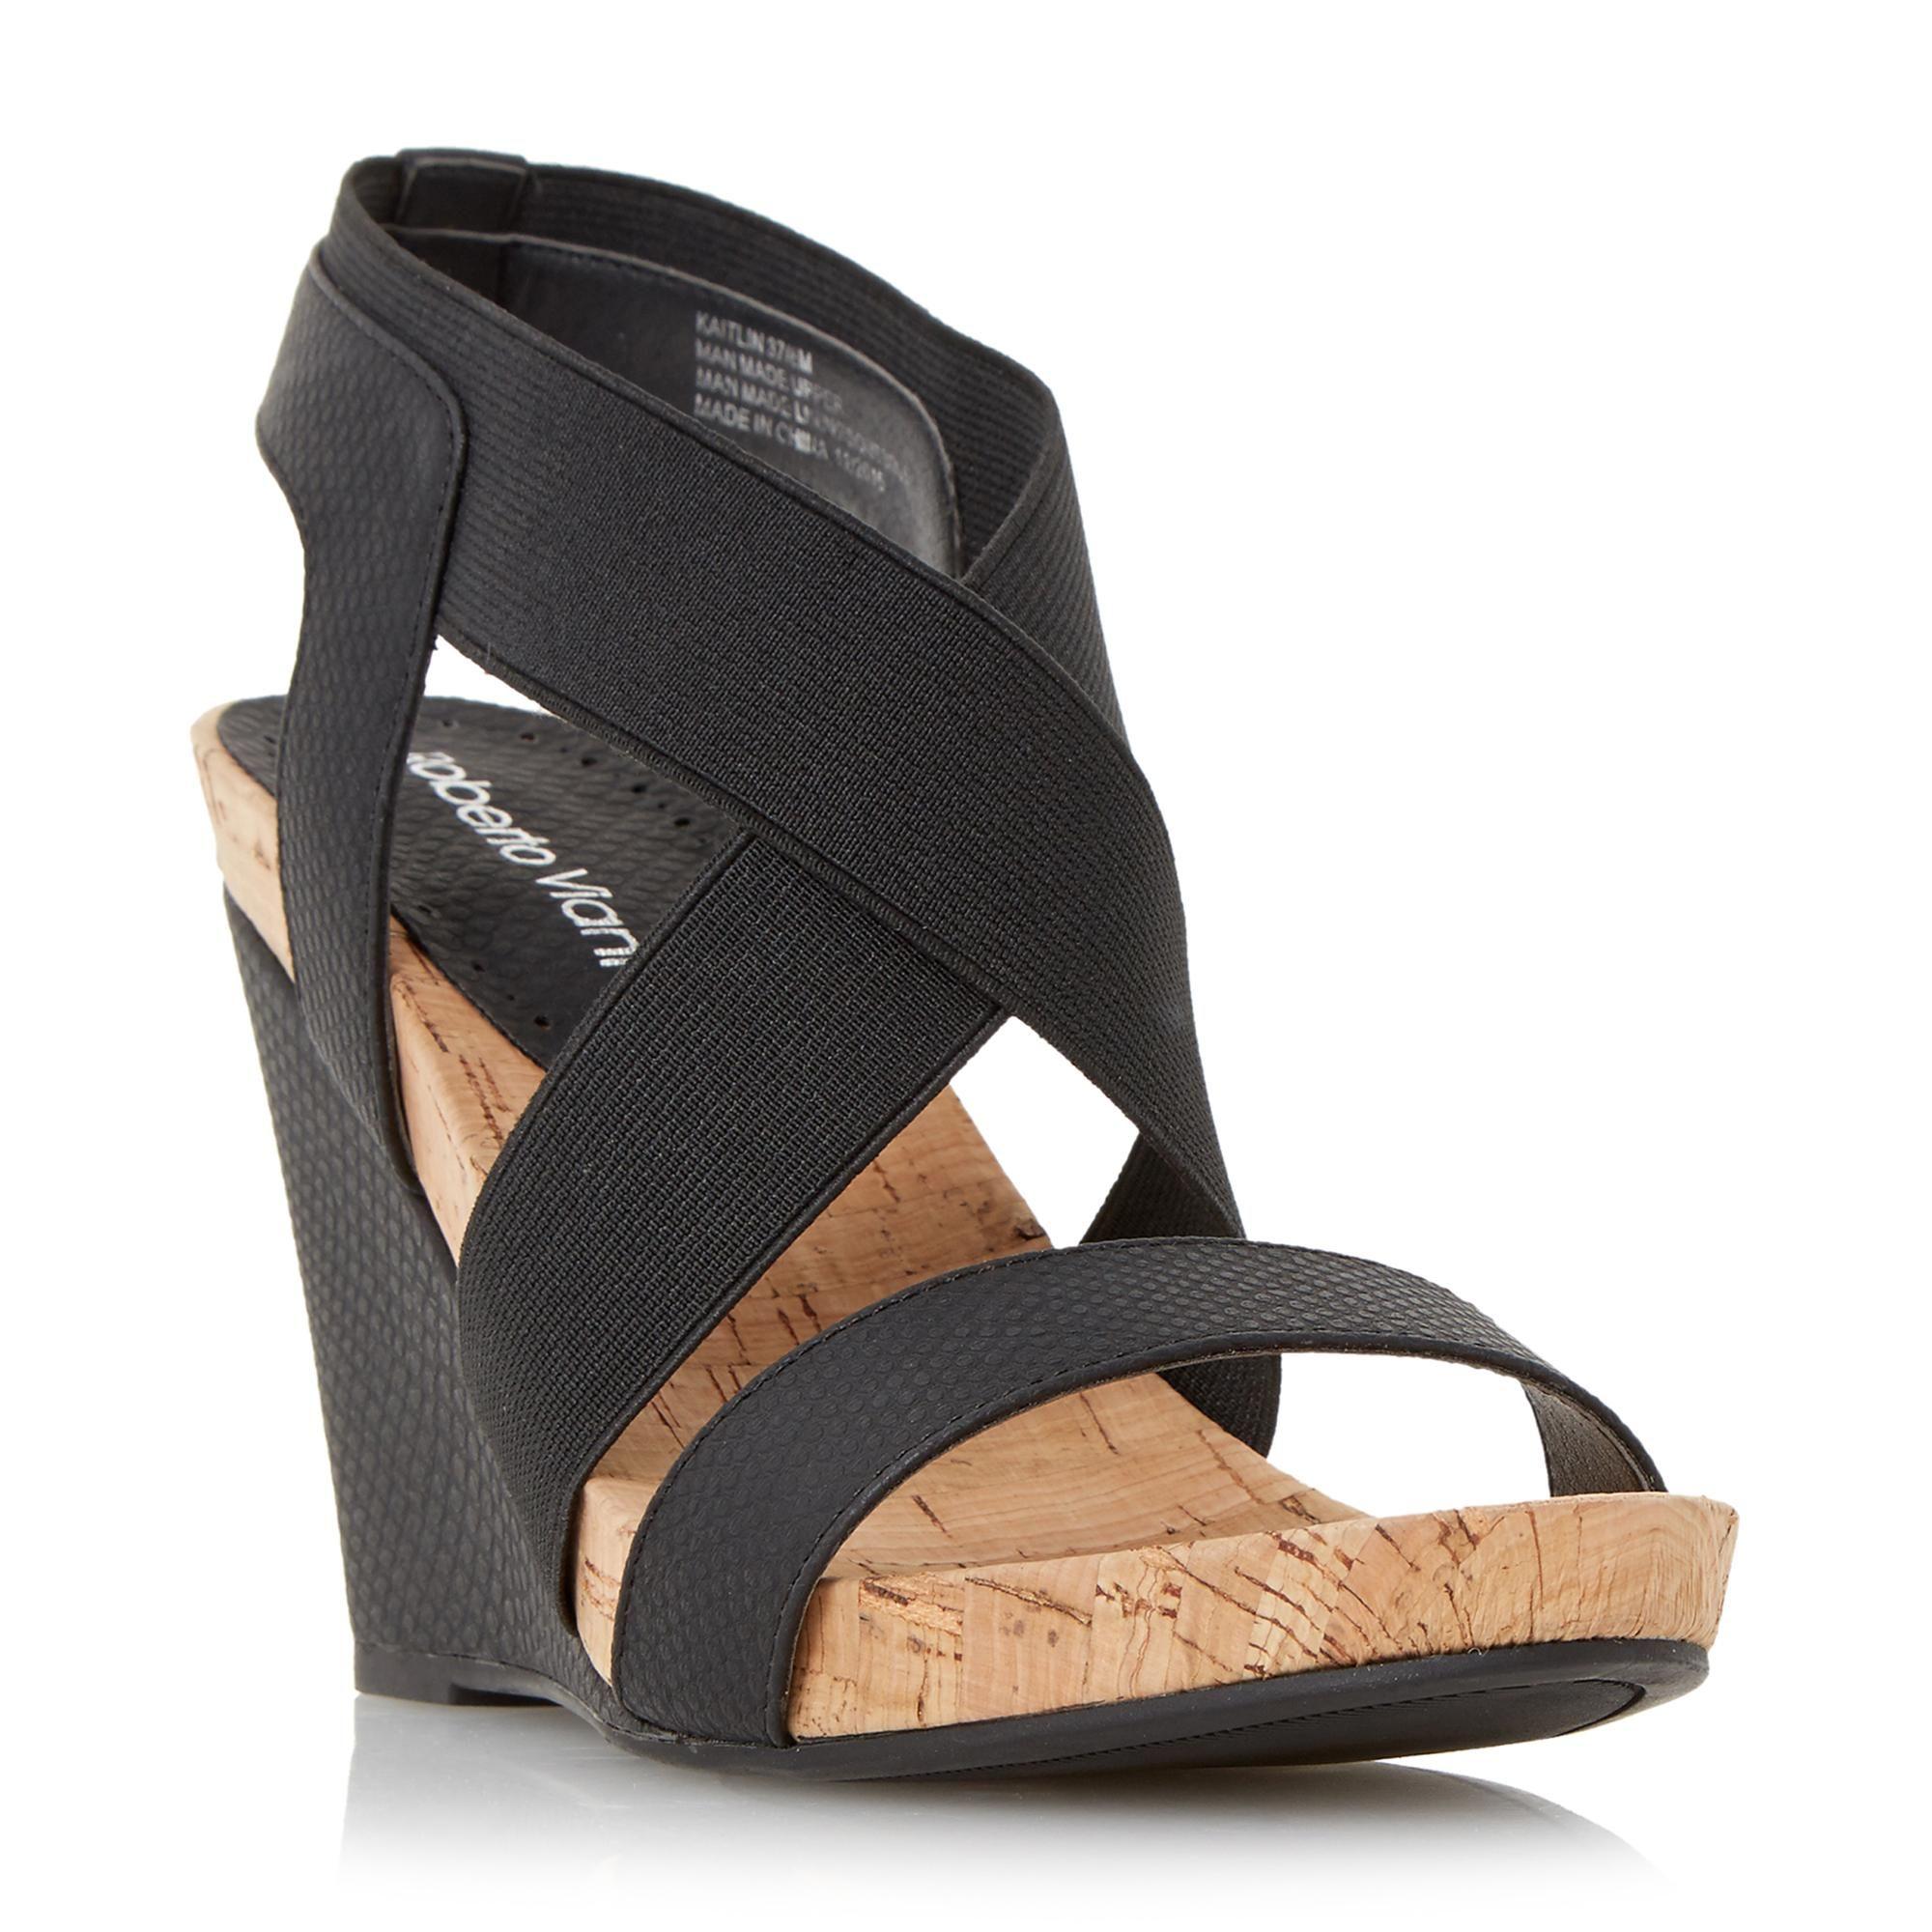 Dune Shoes Online   Wedge sandals